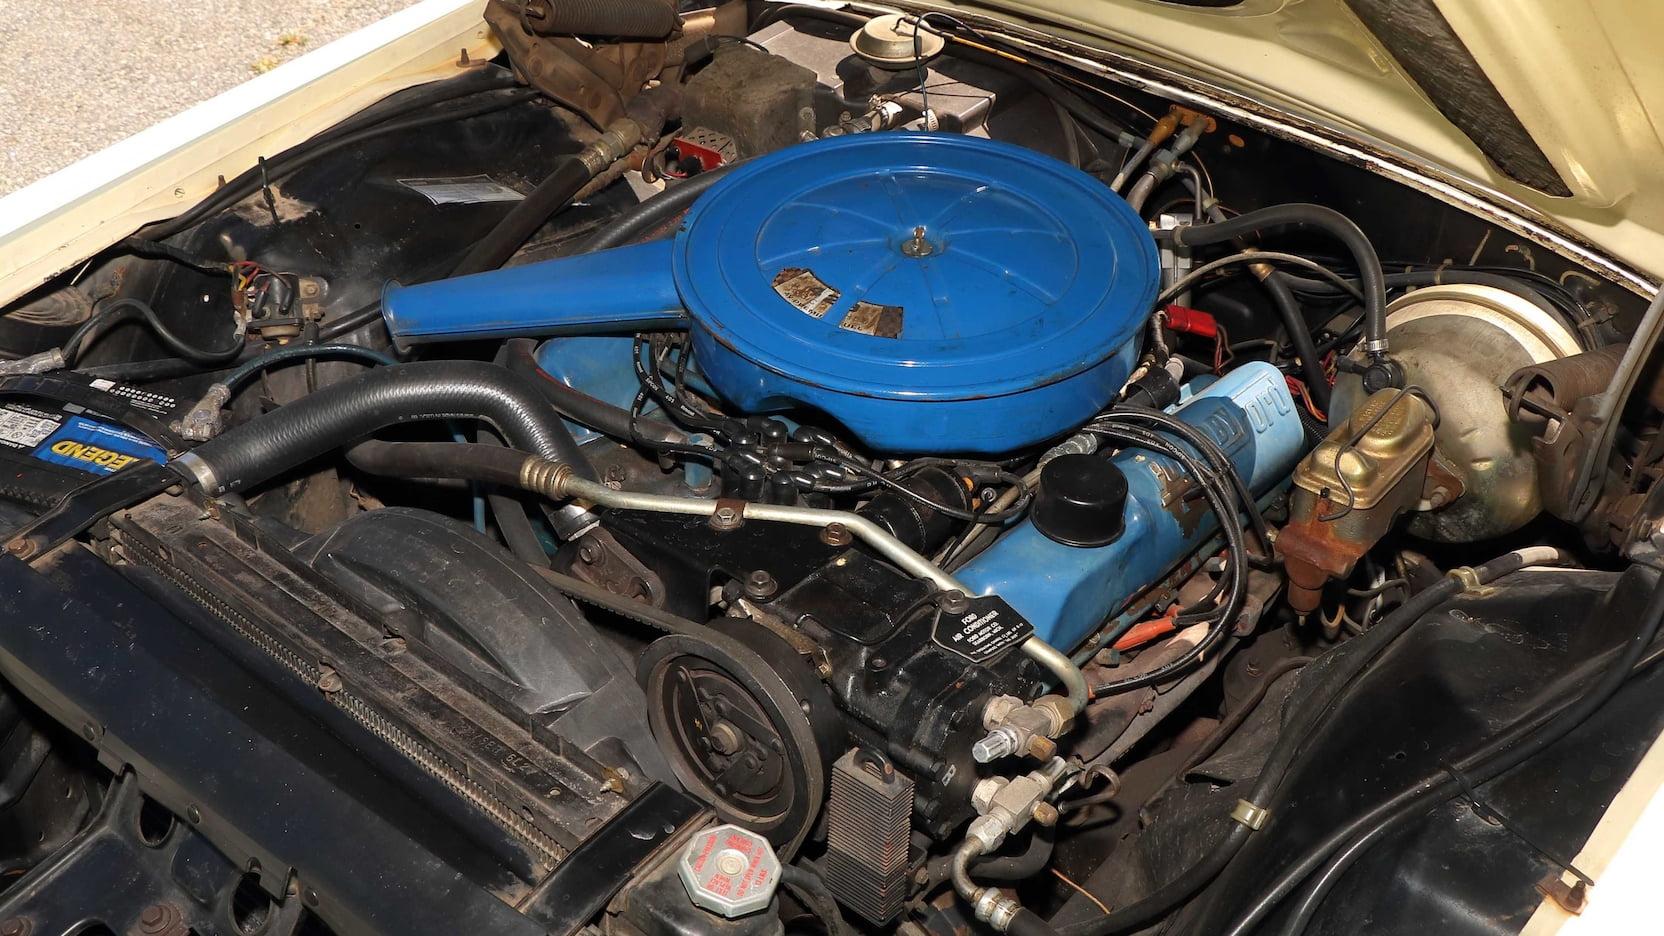 1967 Ford Thunderbird engine